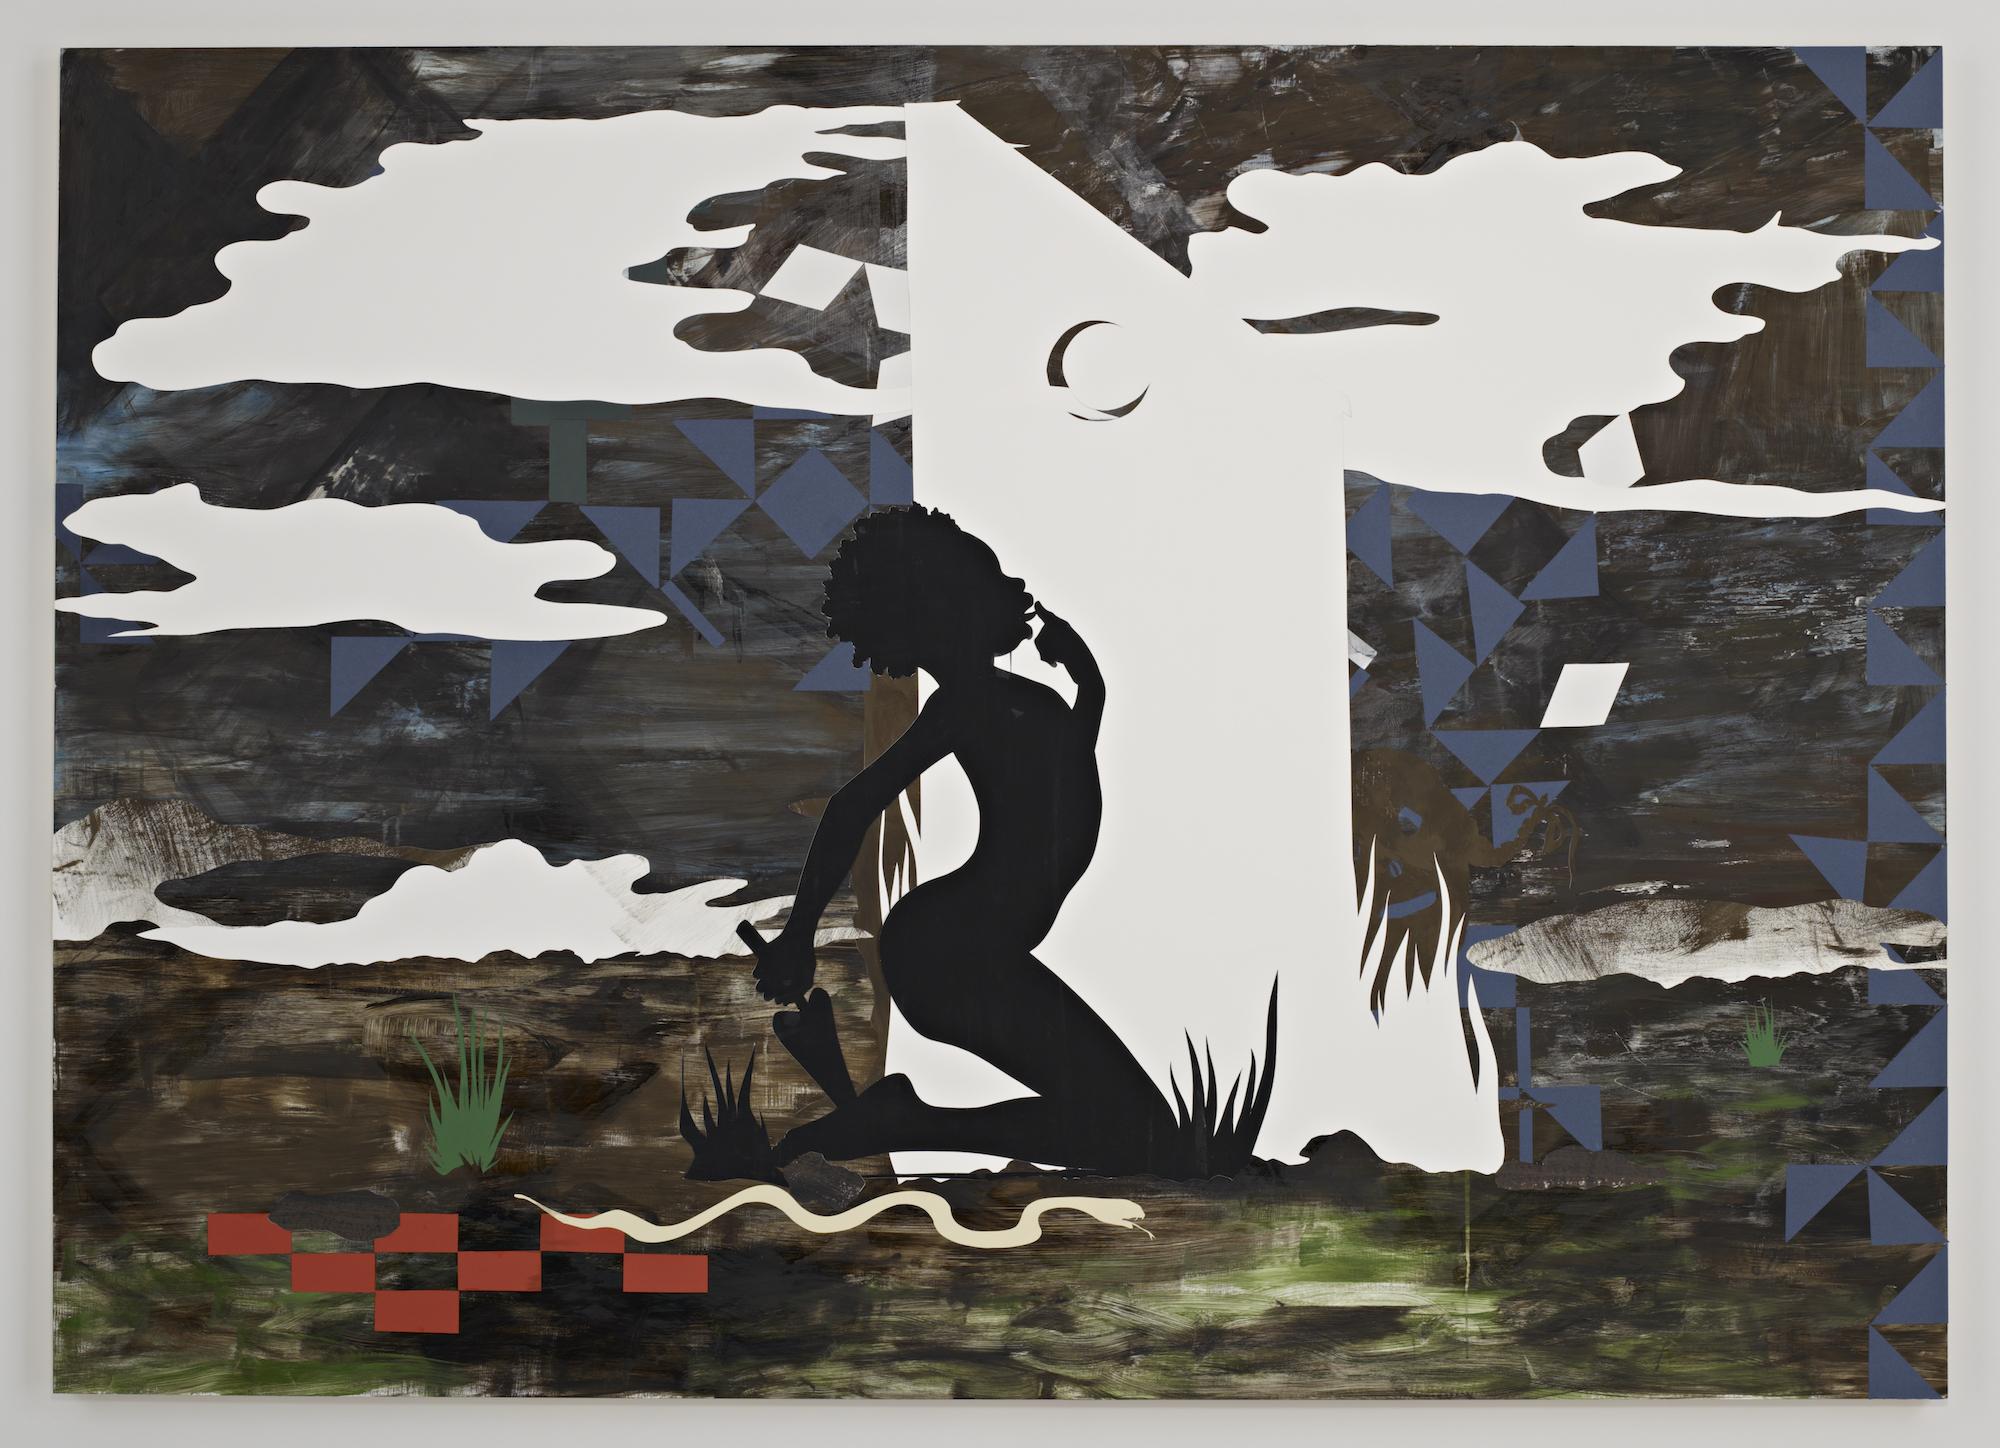 Kara Walker, Mississippi Mud , 2007. Mixed media, cut paper, casein on gessoed panel, 60 x 84 x 2 inches.